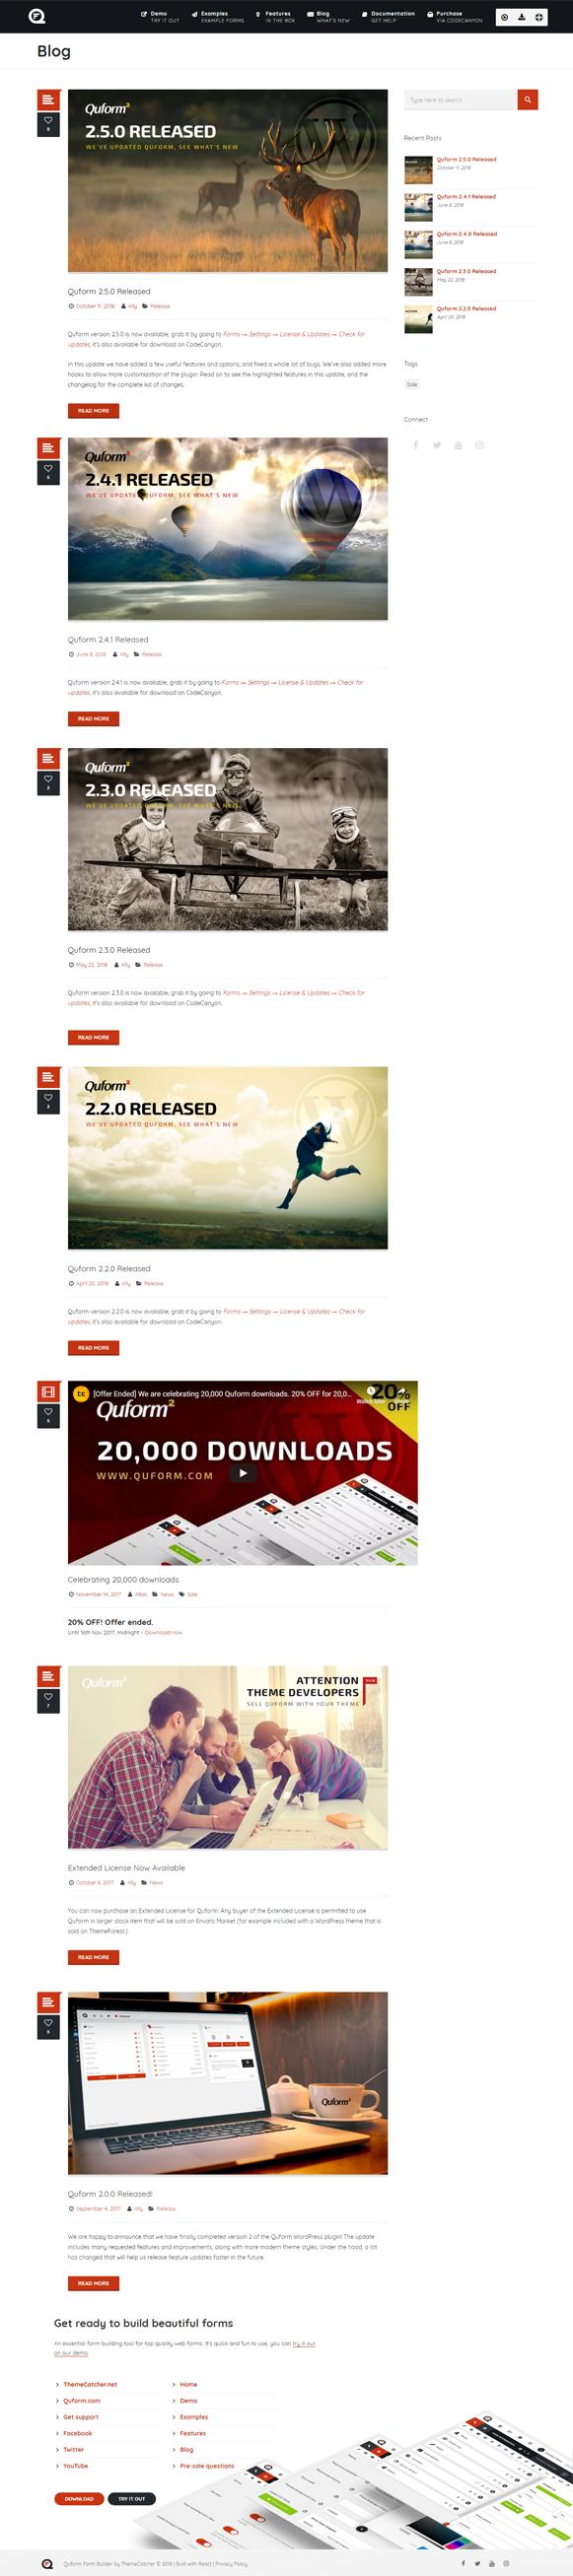 Blog - Quform WordPress Form Plugin